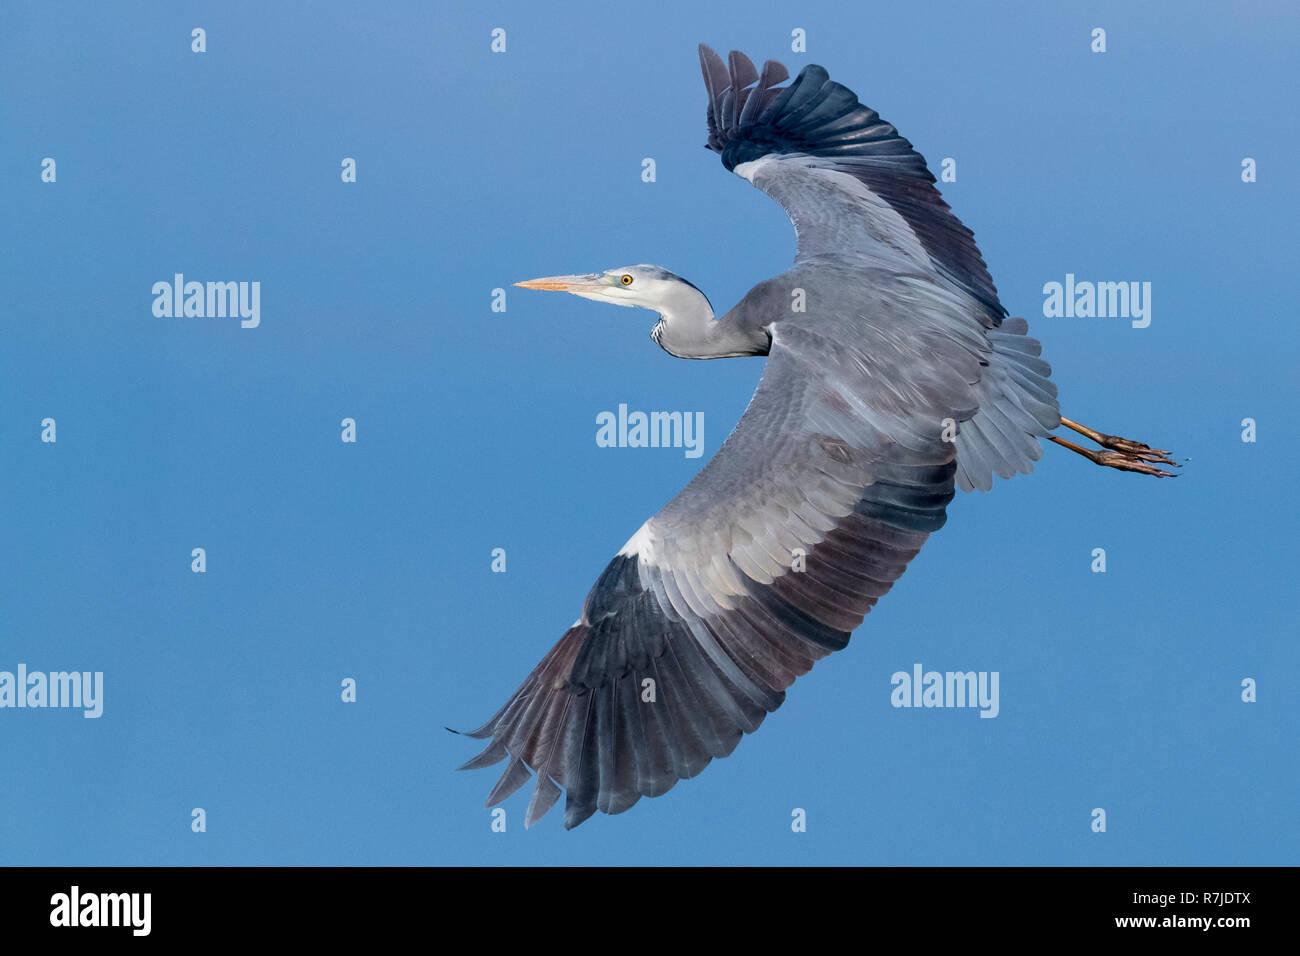 Grey Heron (Ardea cinerea), immature in flight showing upperwings - Stock Image